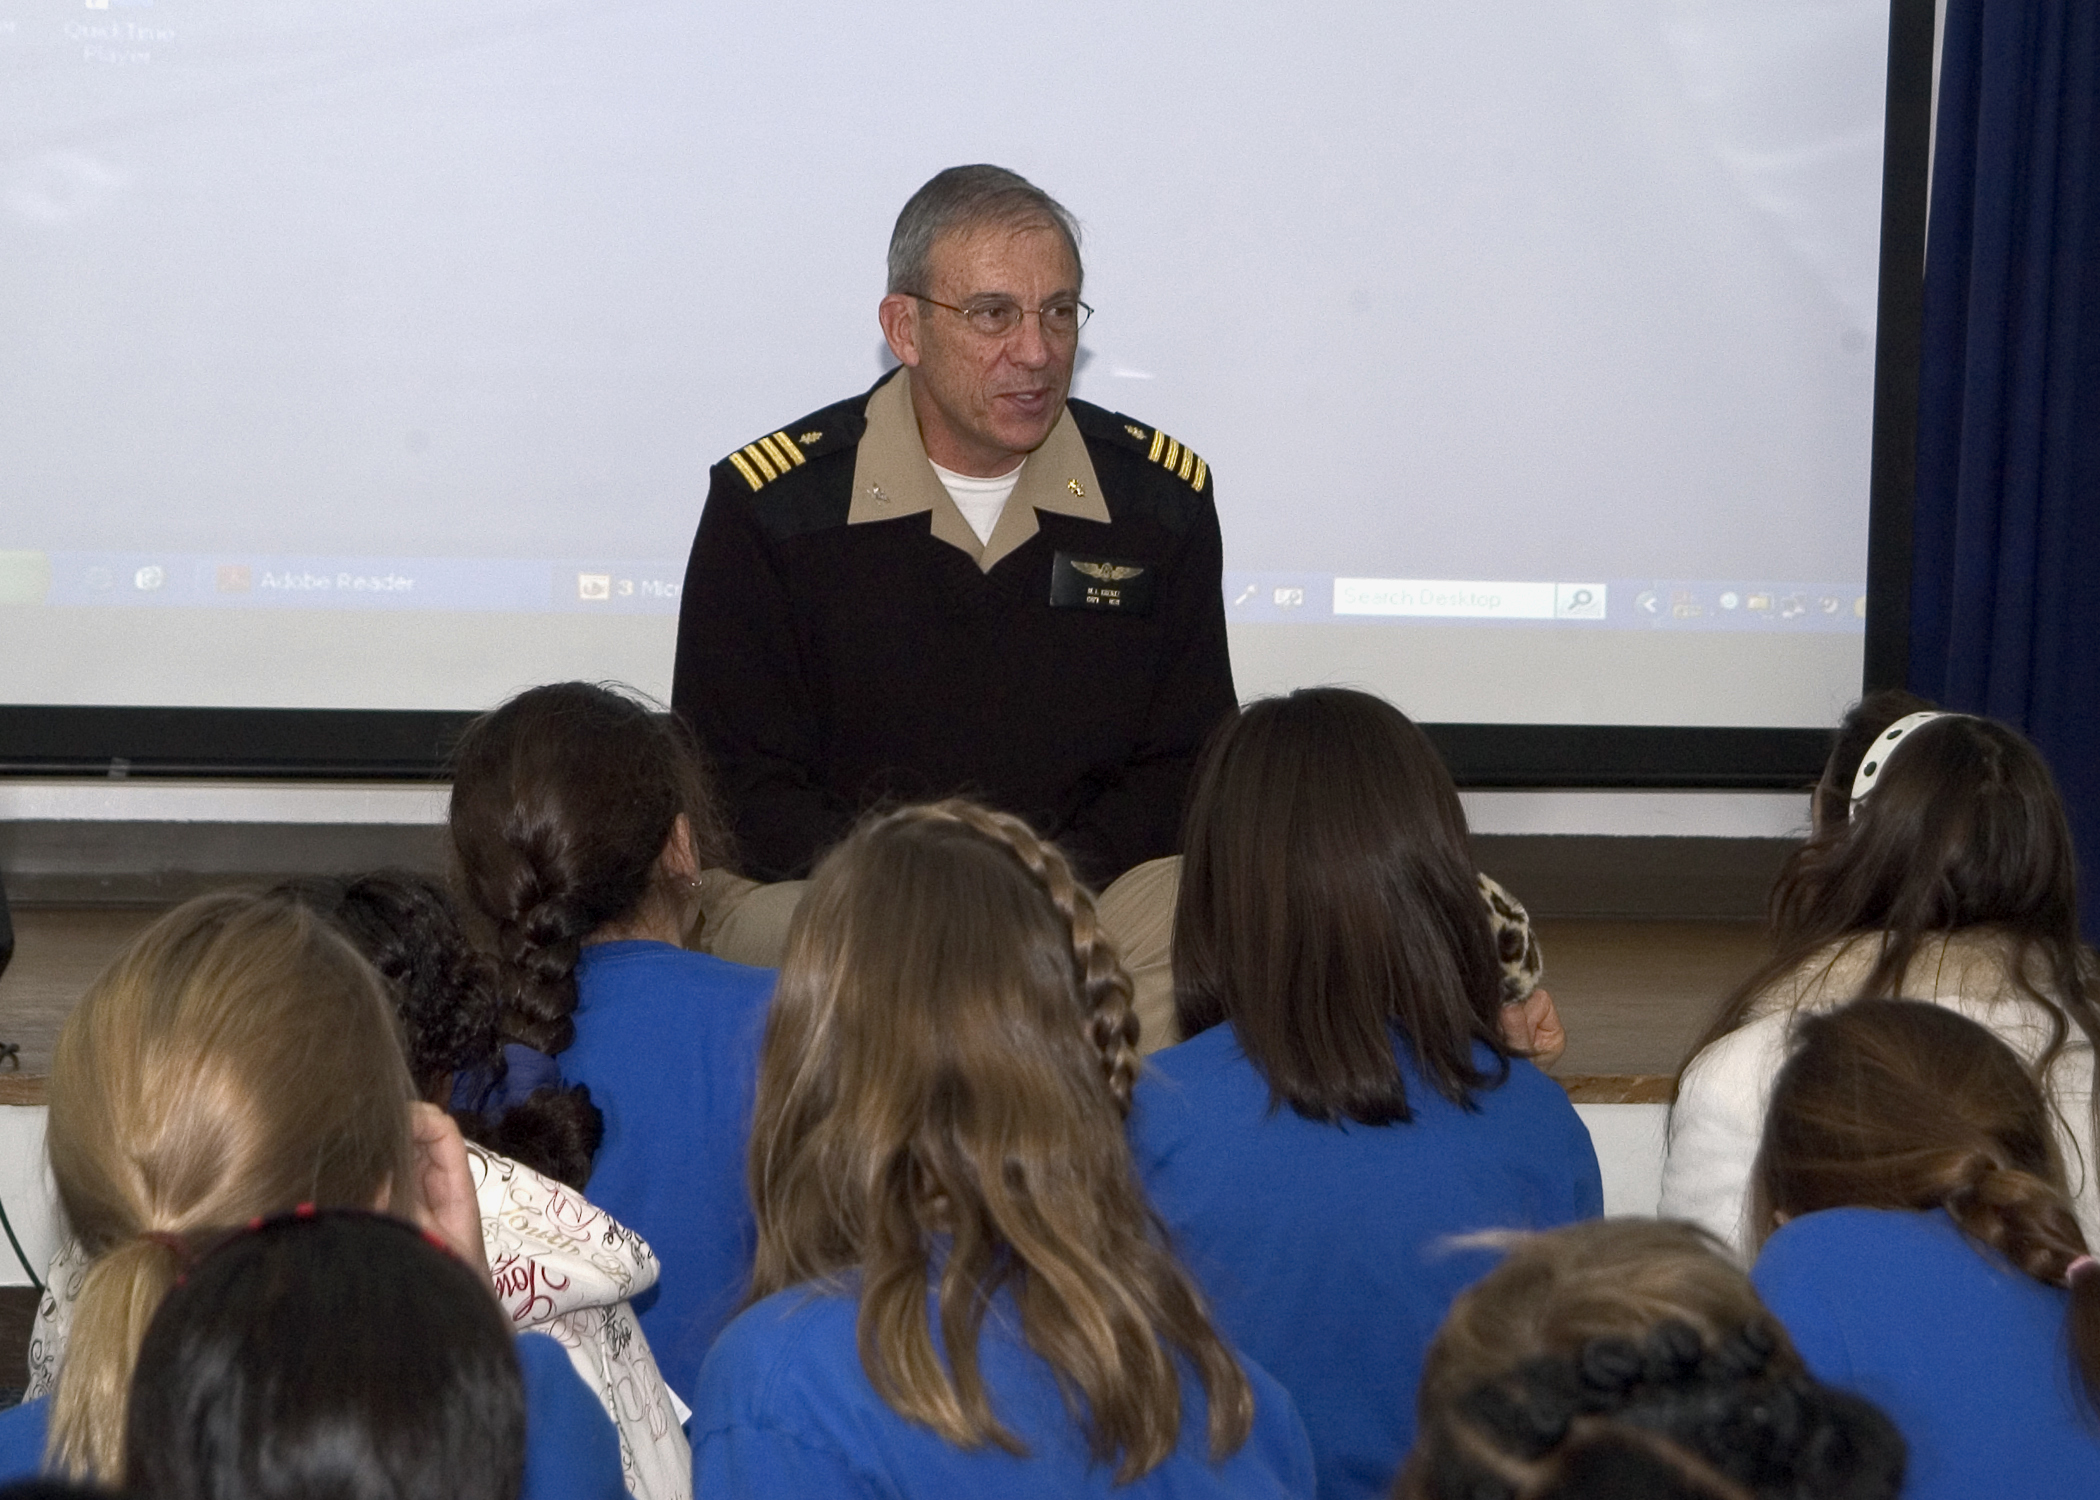 Fileus Navy 080114 N 0483b 002 Capt Michael J Krentz Commanding